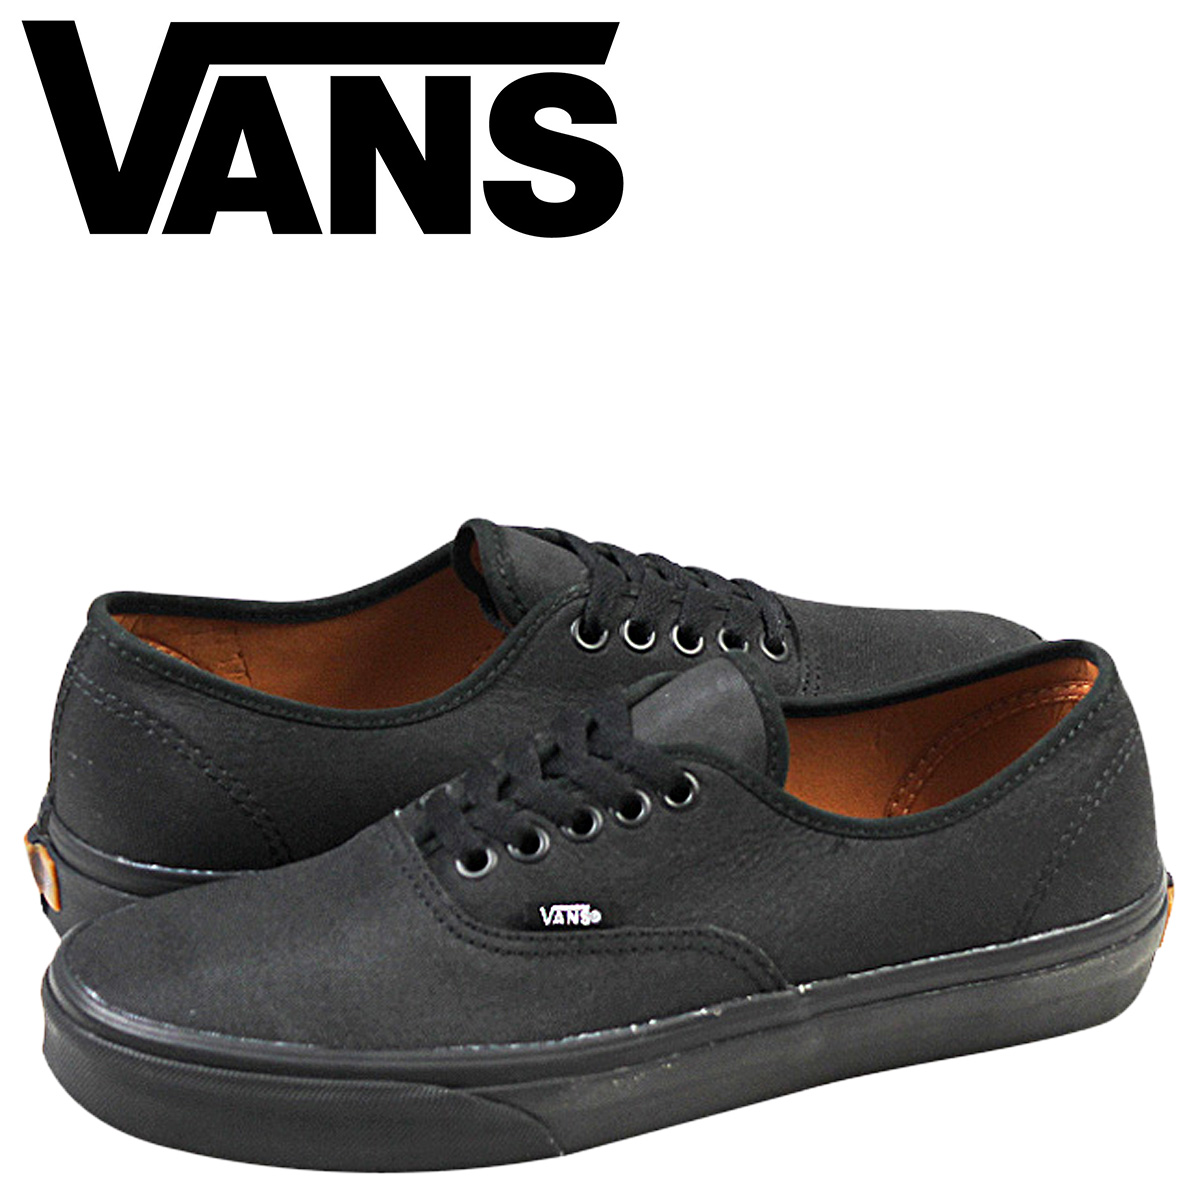 cc070dfa69 Vans XTUFF VANS AUTHENTIC sneakers adidas canvas men's ladies in 2014, new  VN-0 W4NDIZ BLACK/BRAN black unisex [genuine]